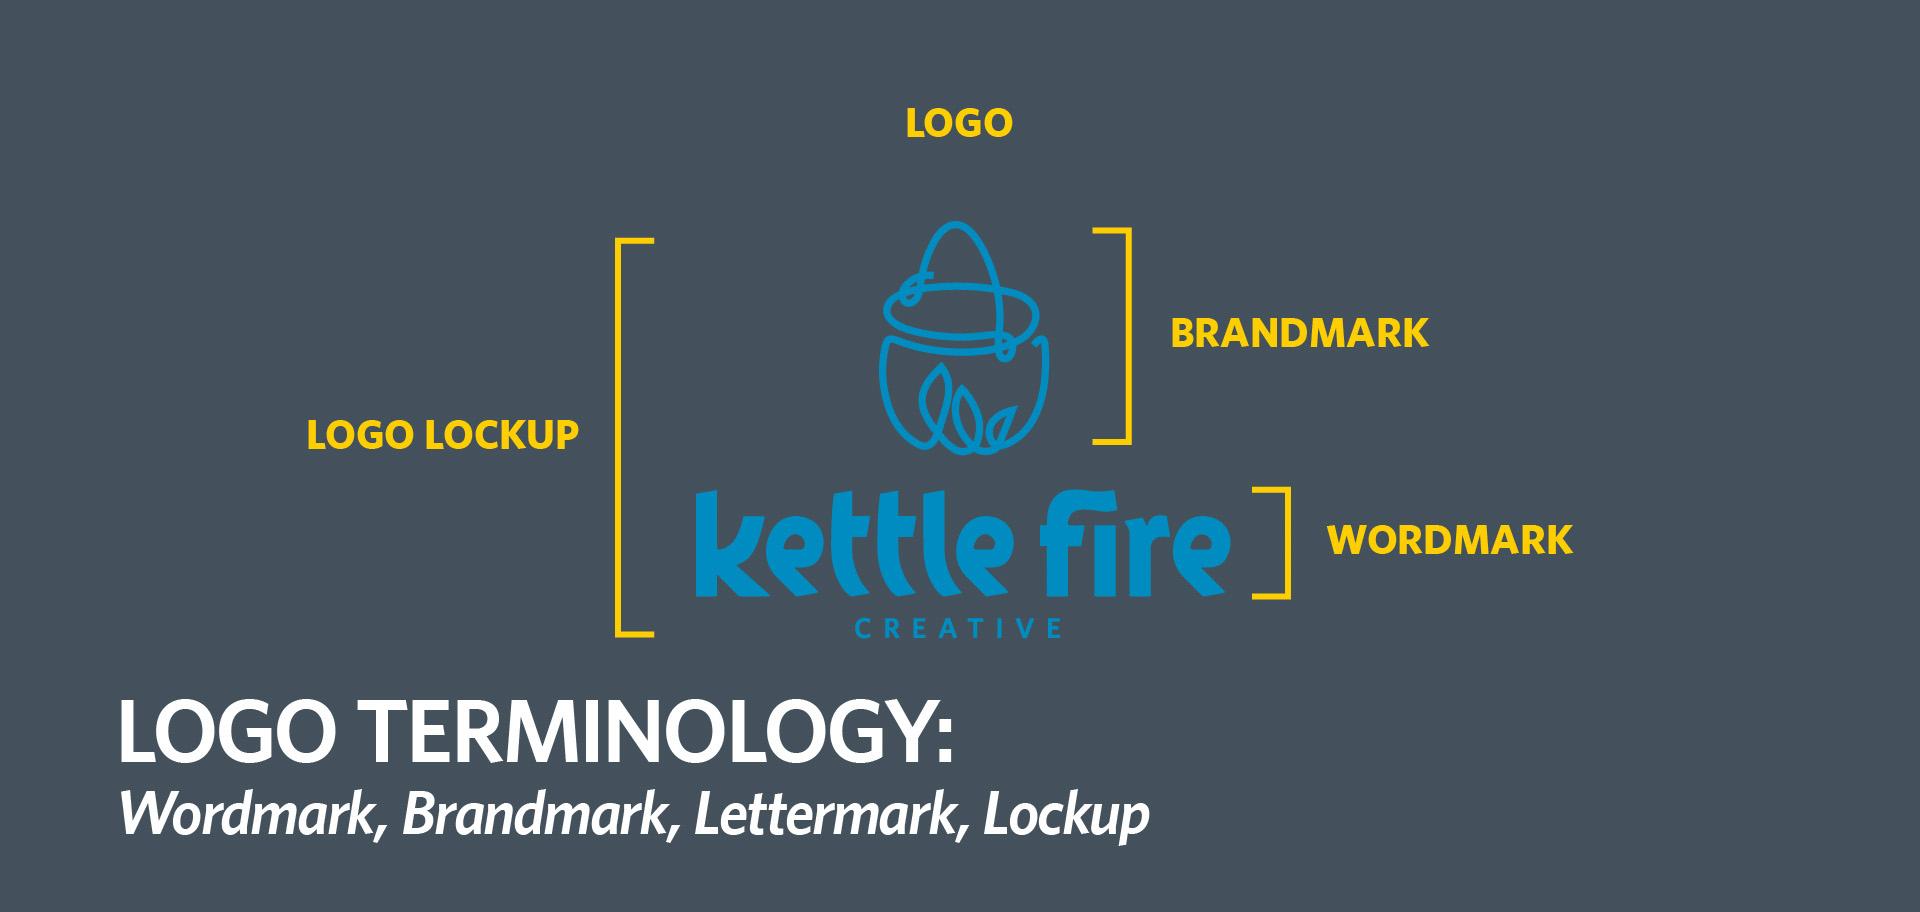 Logo terminology wordmark brandmark lettermark logo lockup design Kettle Fire Creative logo terminology Logo Terminology: Wordmark, Brandmark, Lettermark, Lockup logo terminology fi